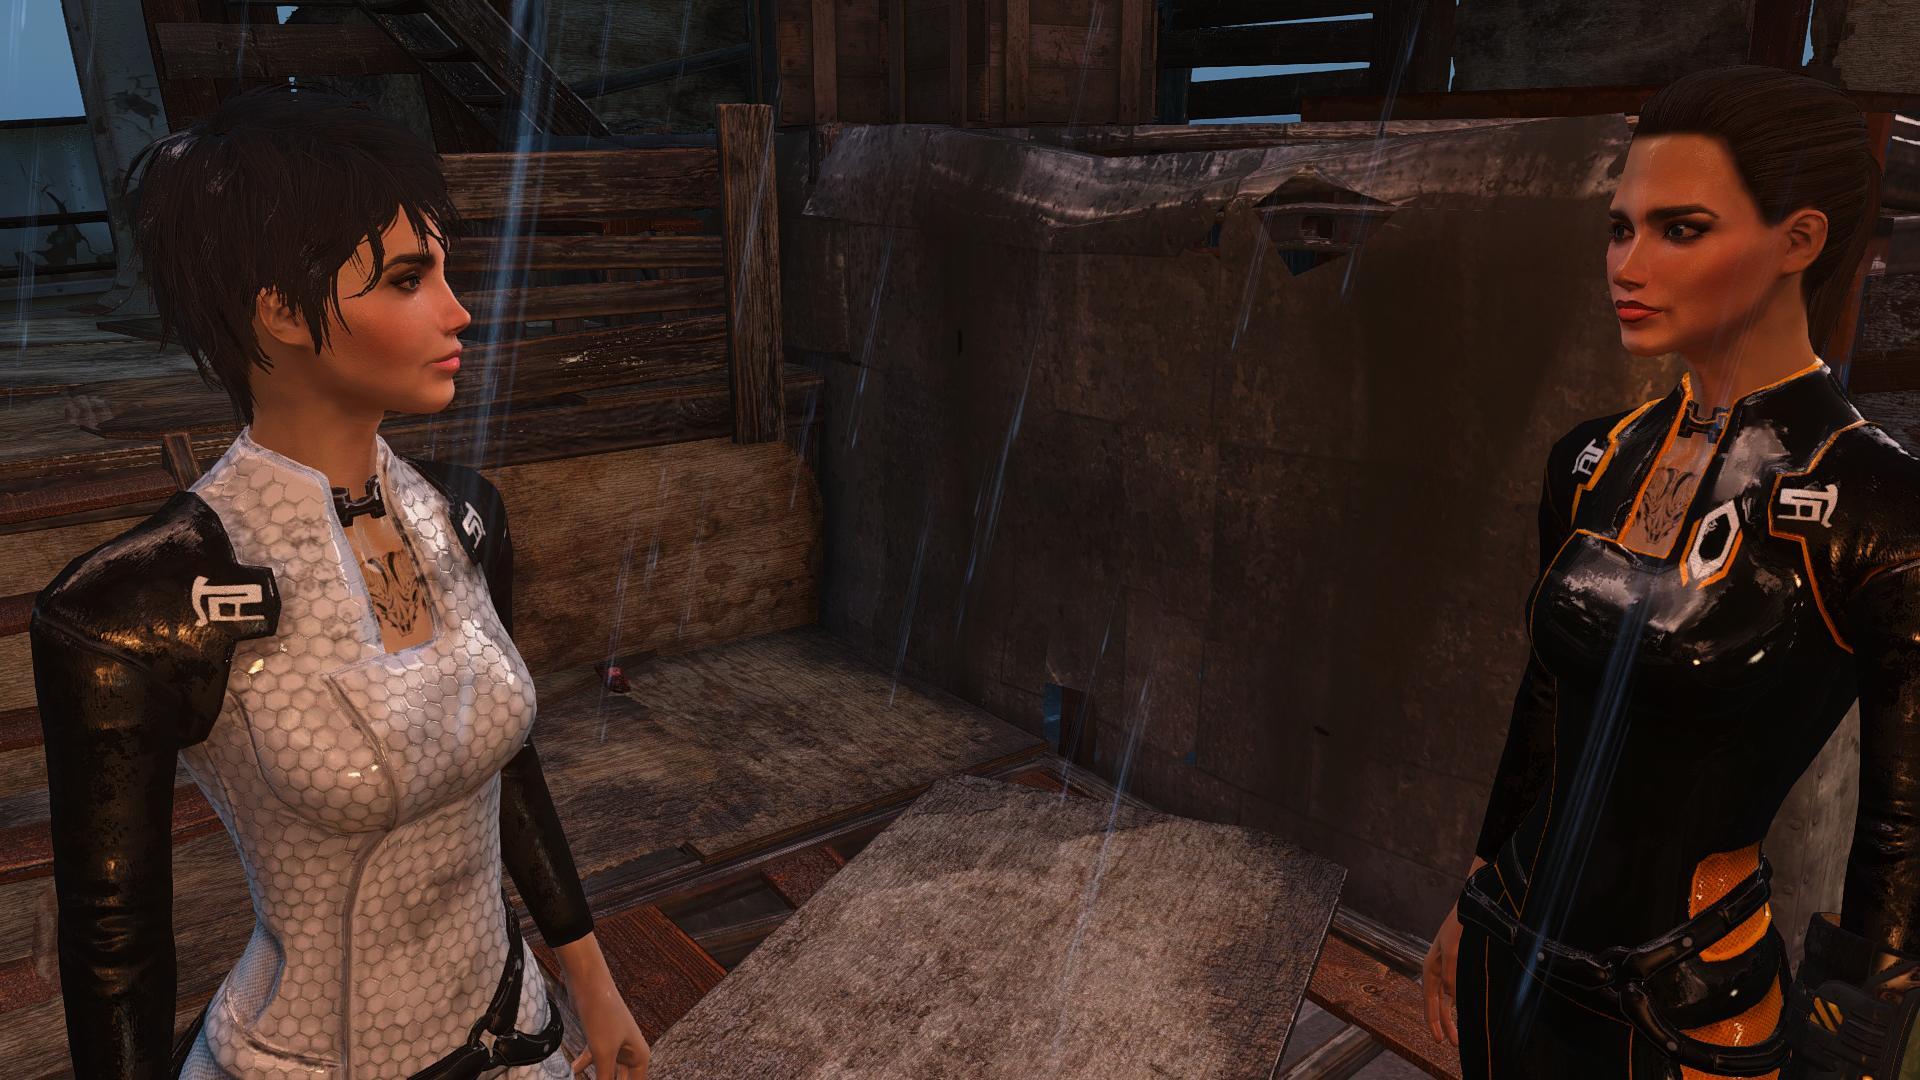 000515.Jpg - Fallout 4